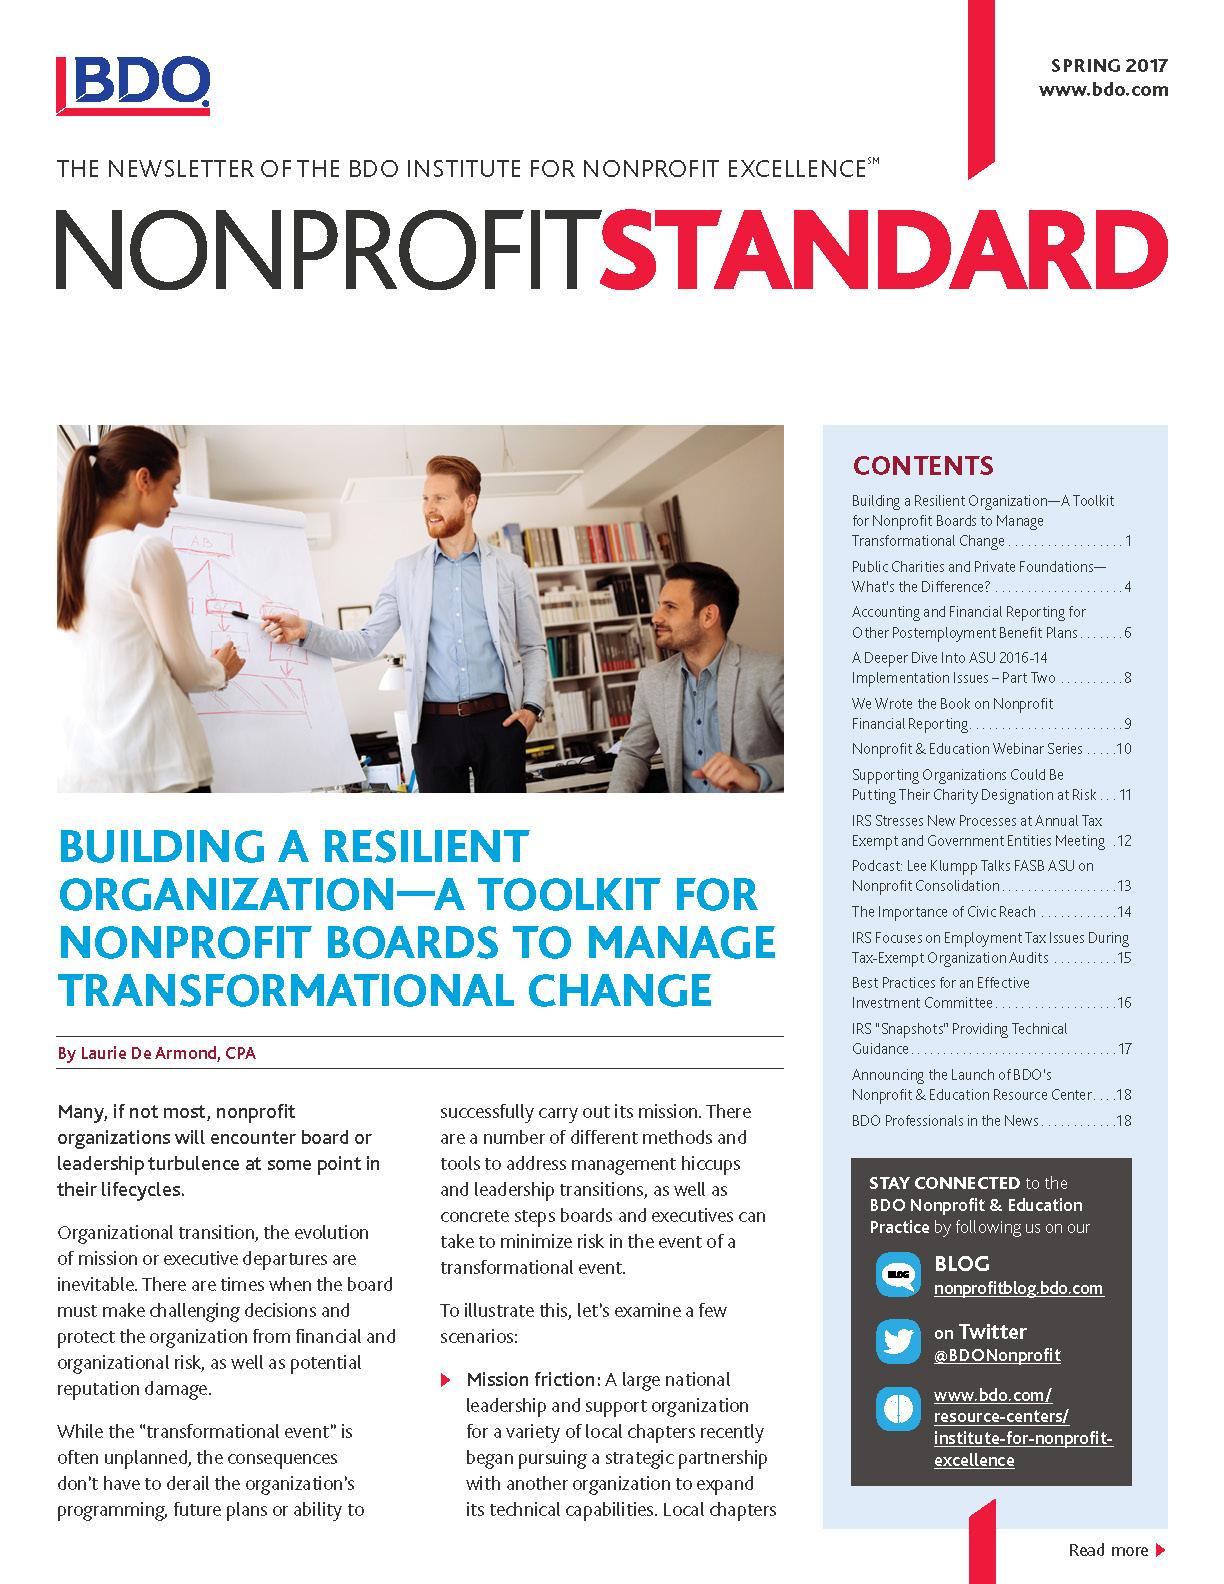 spring nonprofit standard newsletter